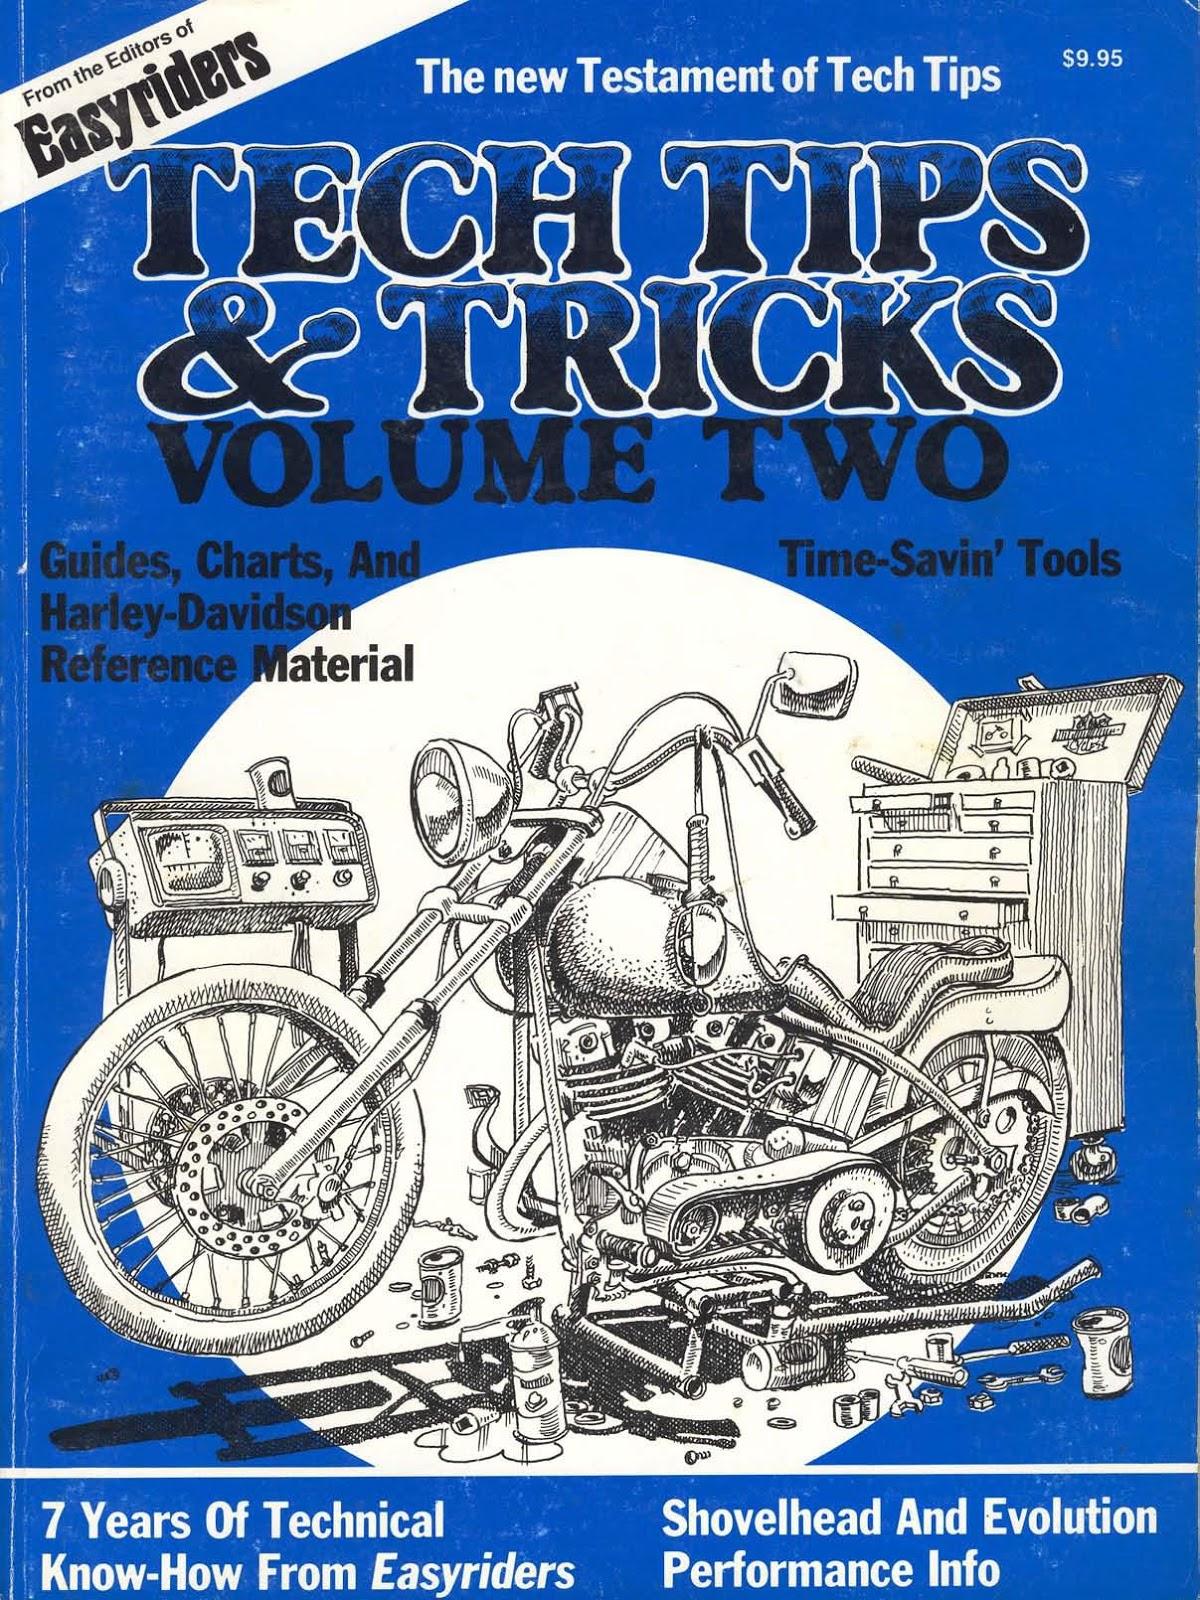 Chopper Creeps: Vintage Easy Rider Tips & Tricks Vol.1-4 on simplified plumbing diagram, simplified battery diagram, simplified clutch diagram,